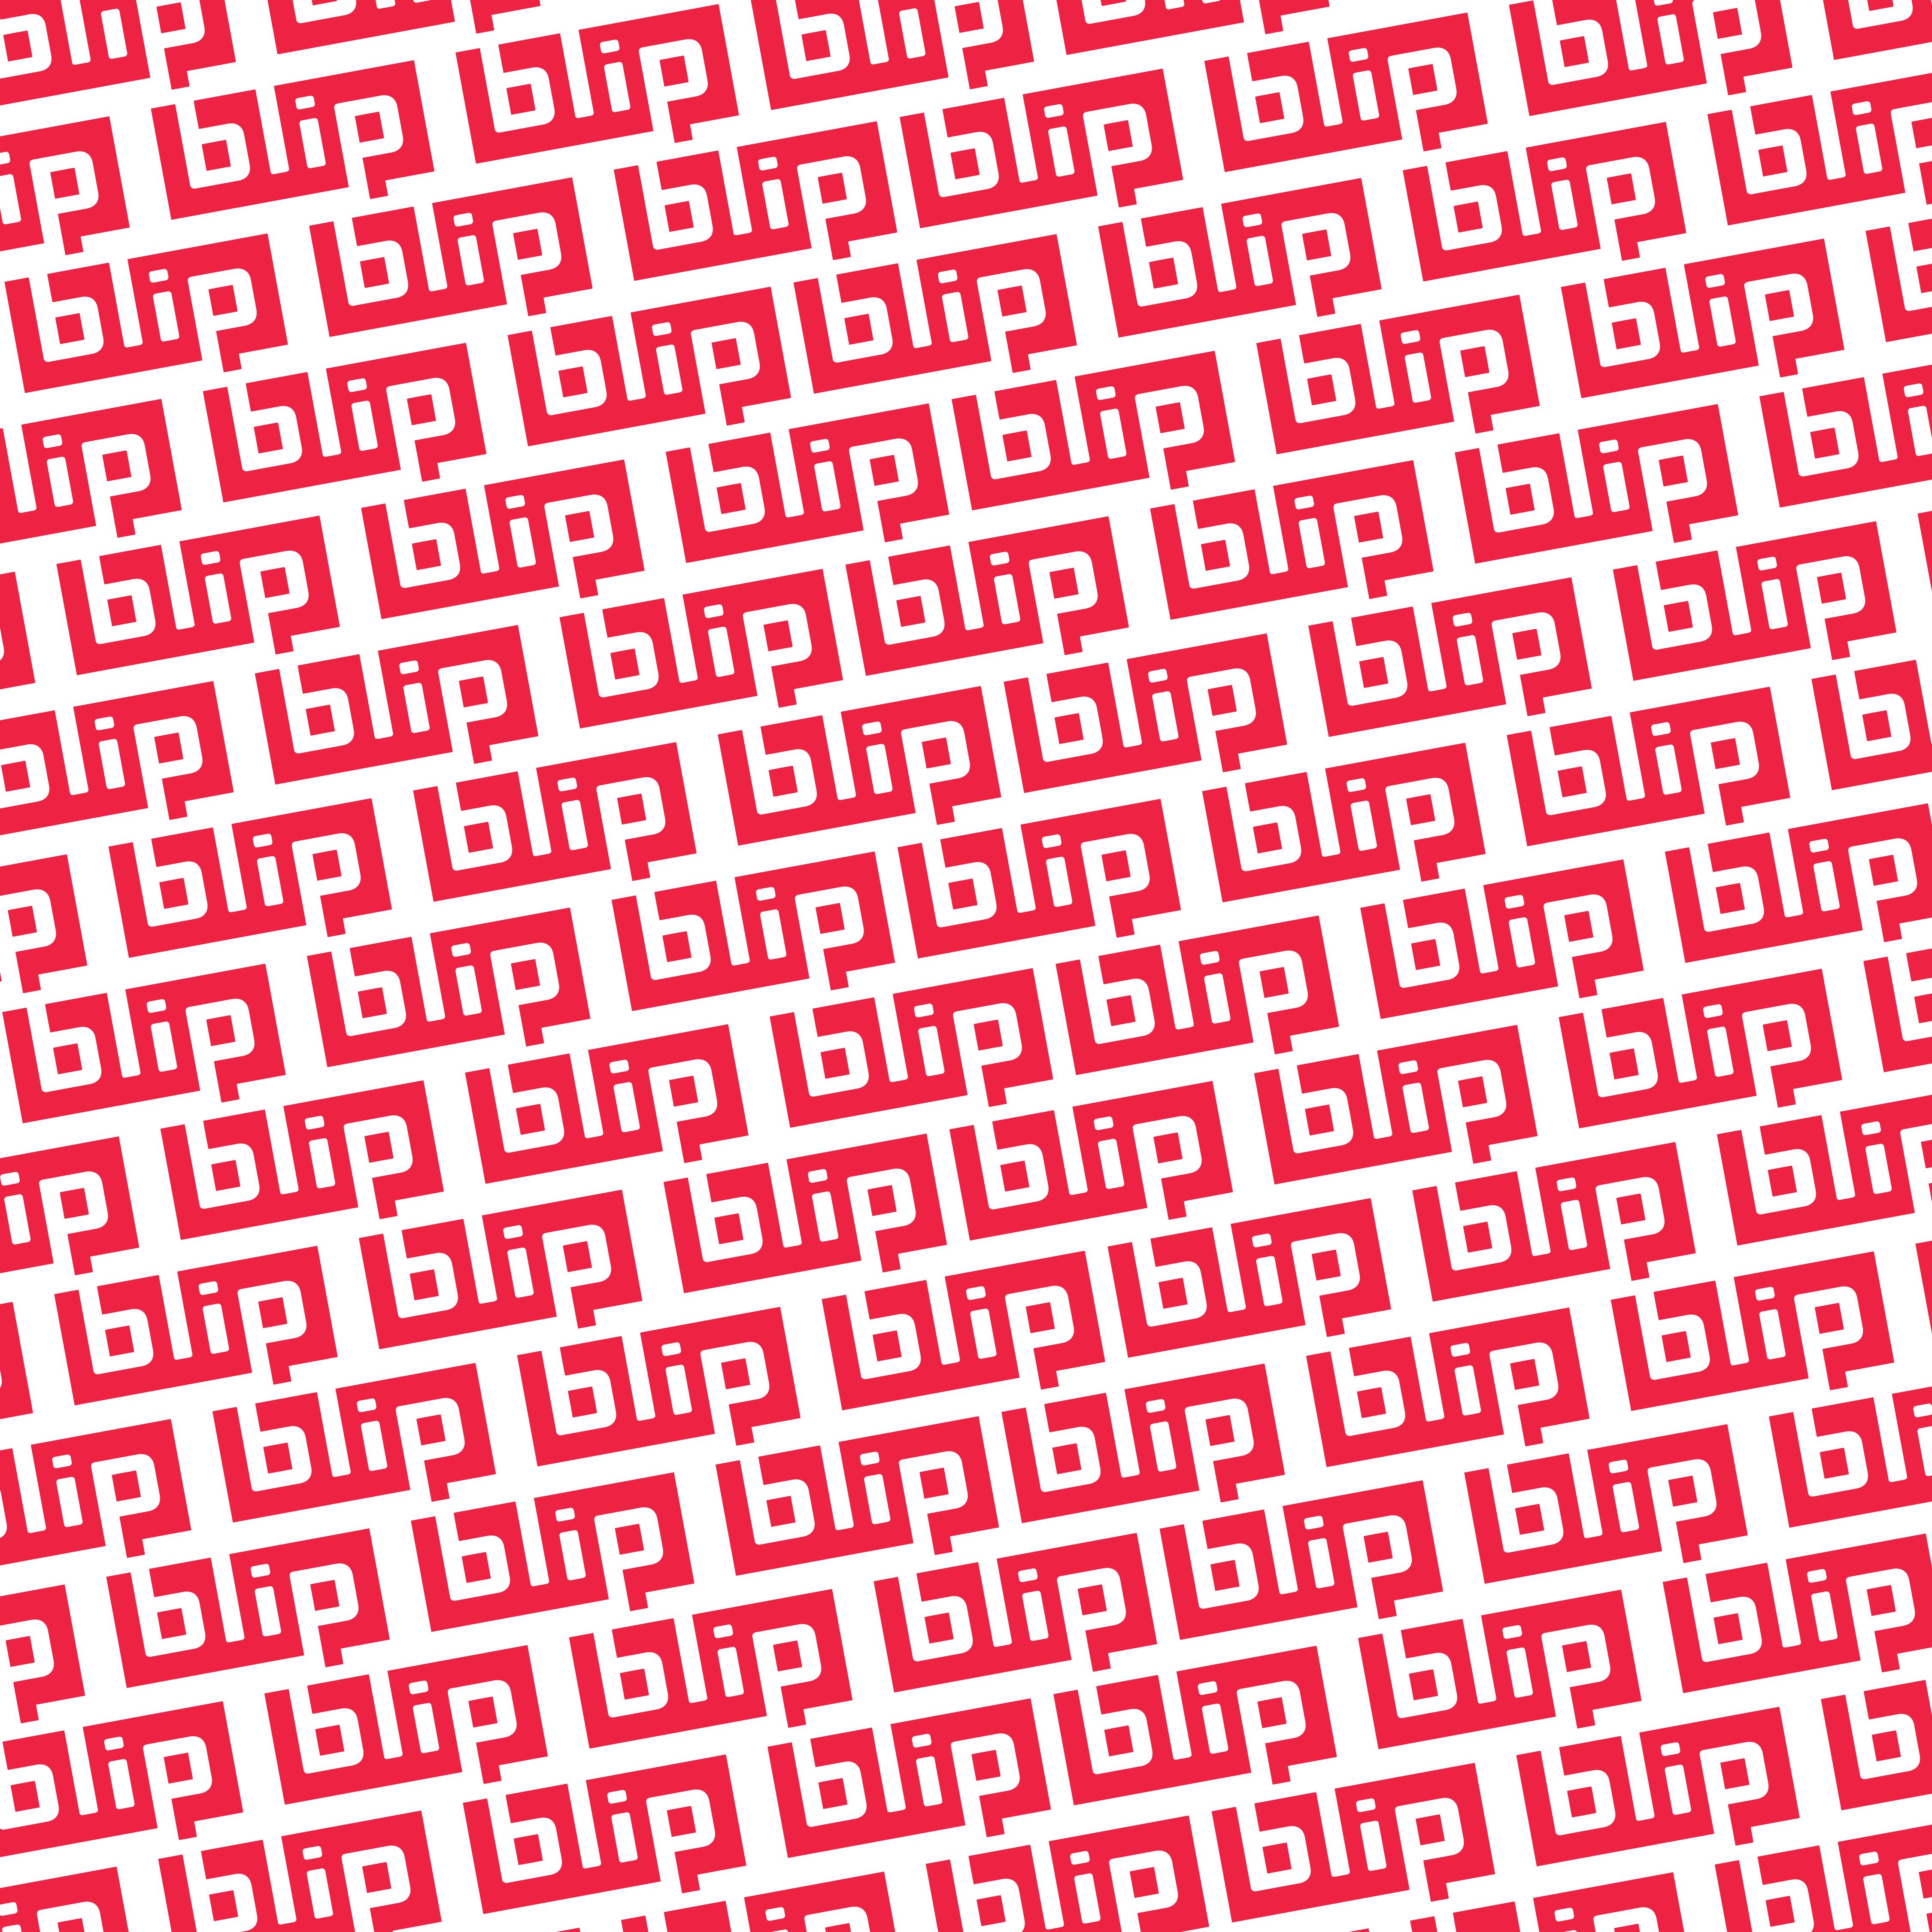 Pin by Blip Billboards on Blip Design Billboard, Self